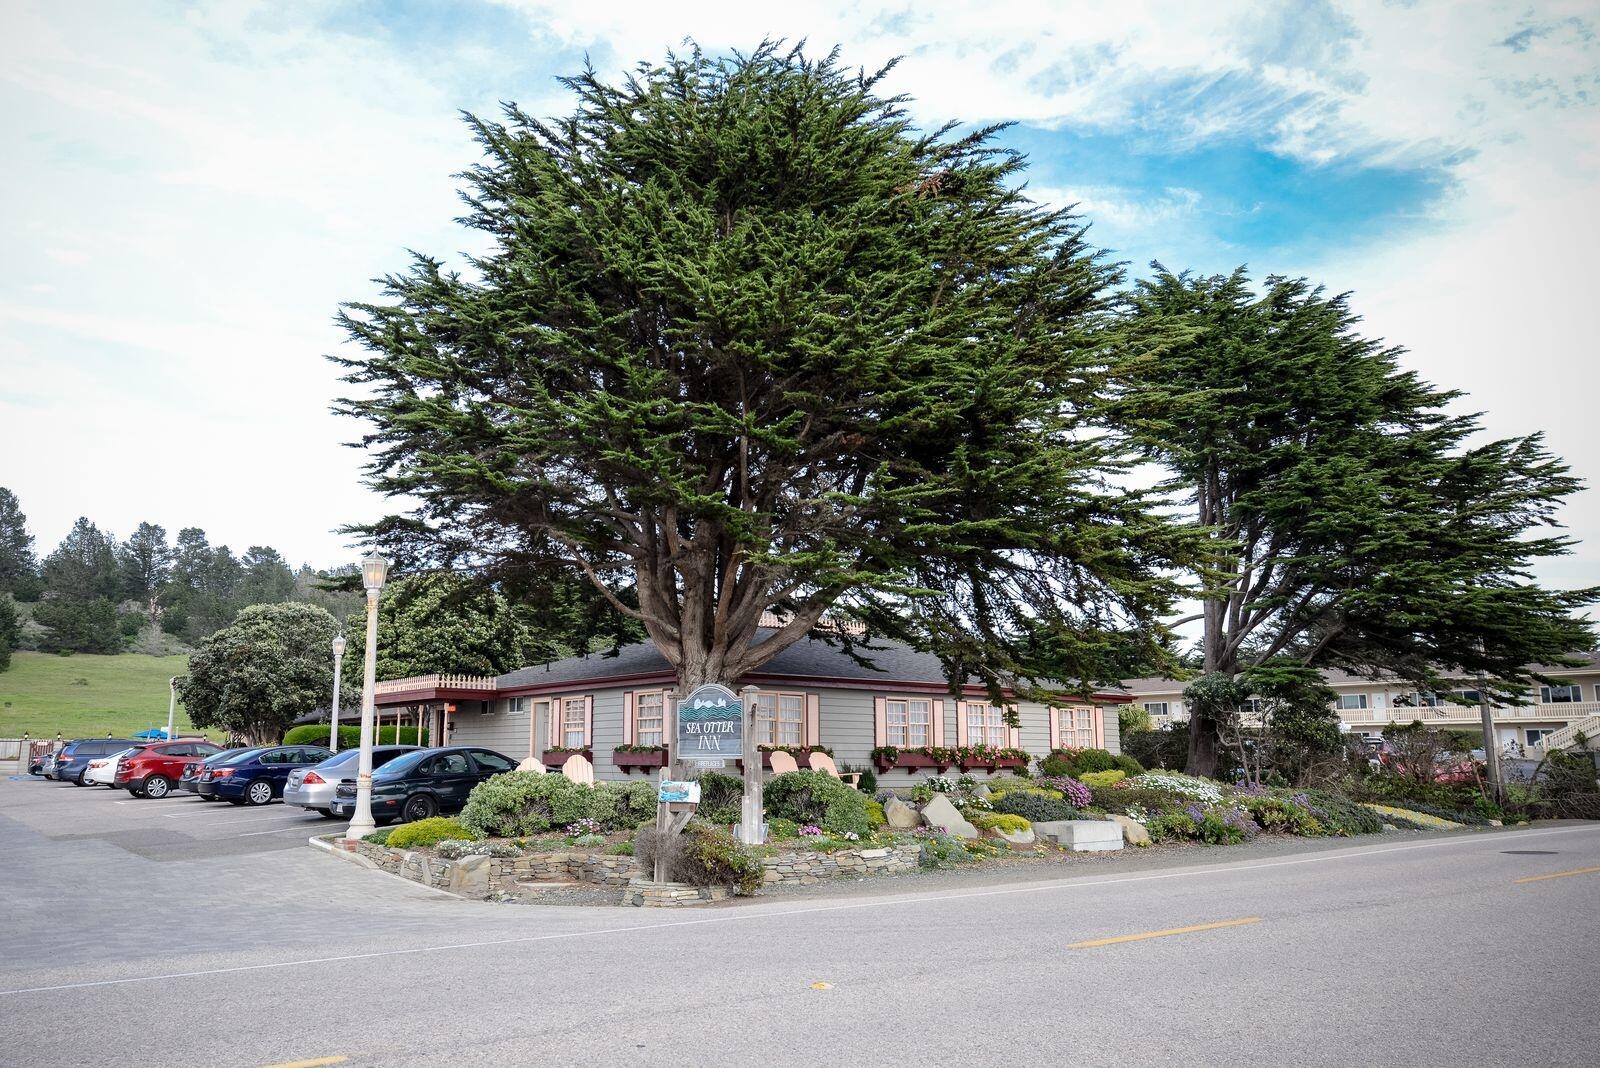 Street view of Sea Otter Inn